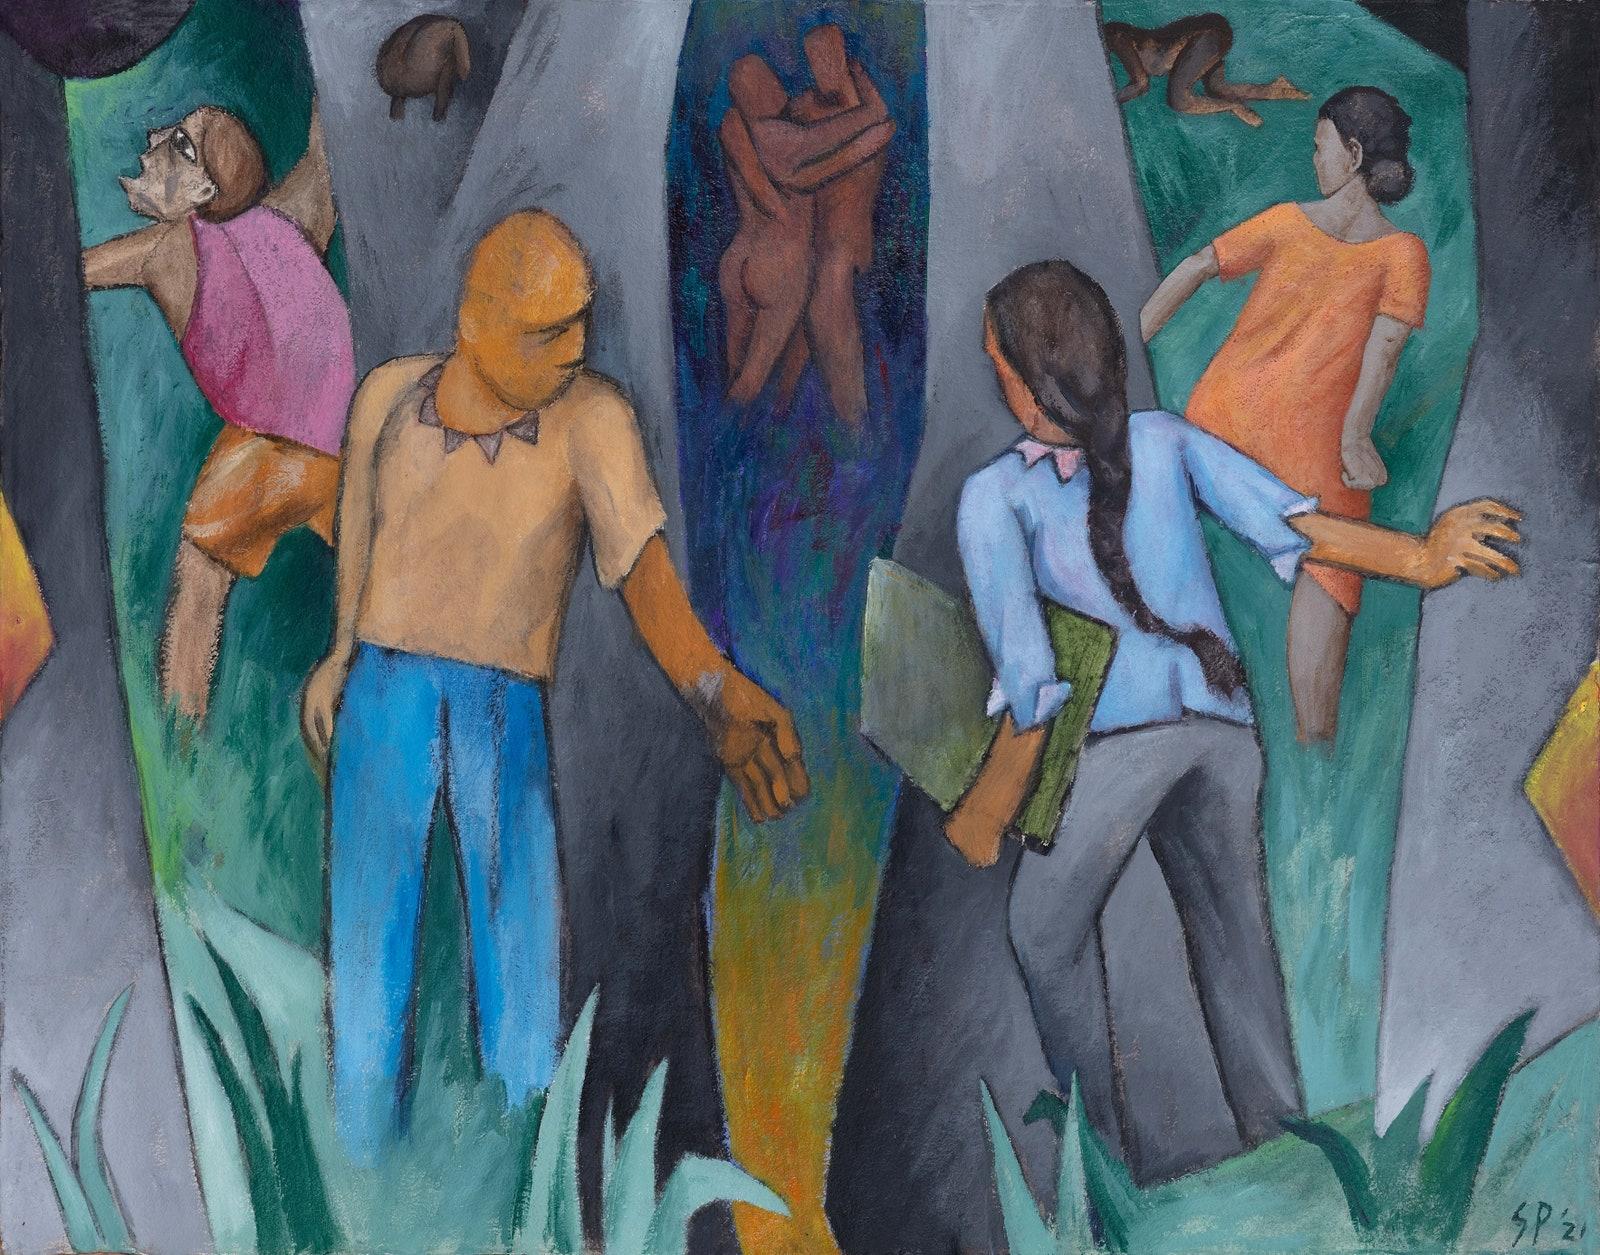 NEW DELHI. L'artiste indien Sudhir Patwardan, Vadhera Art Gallery